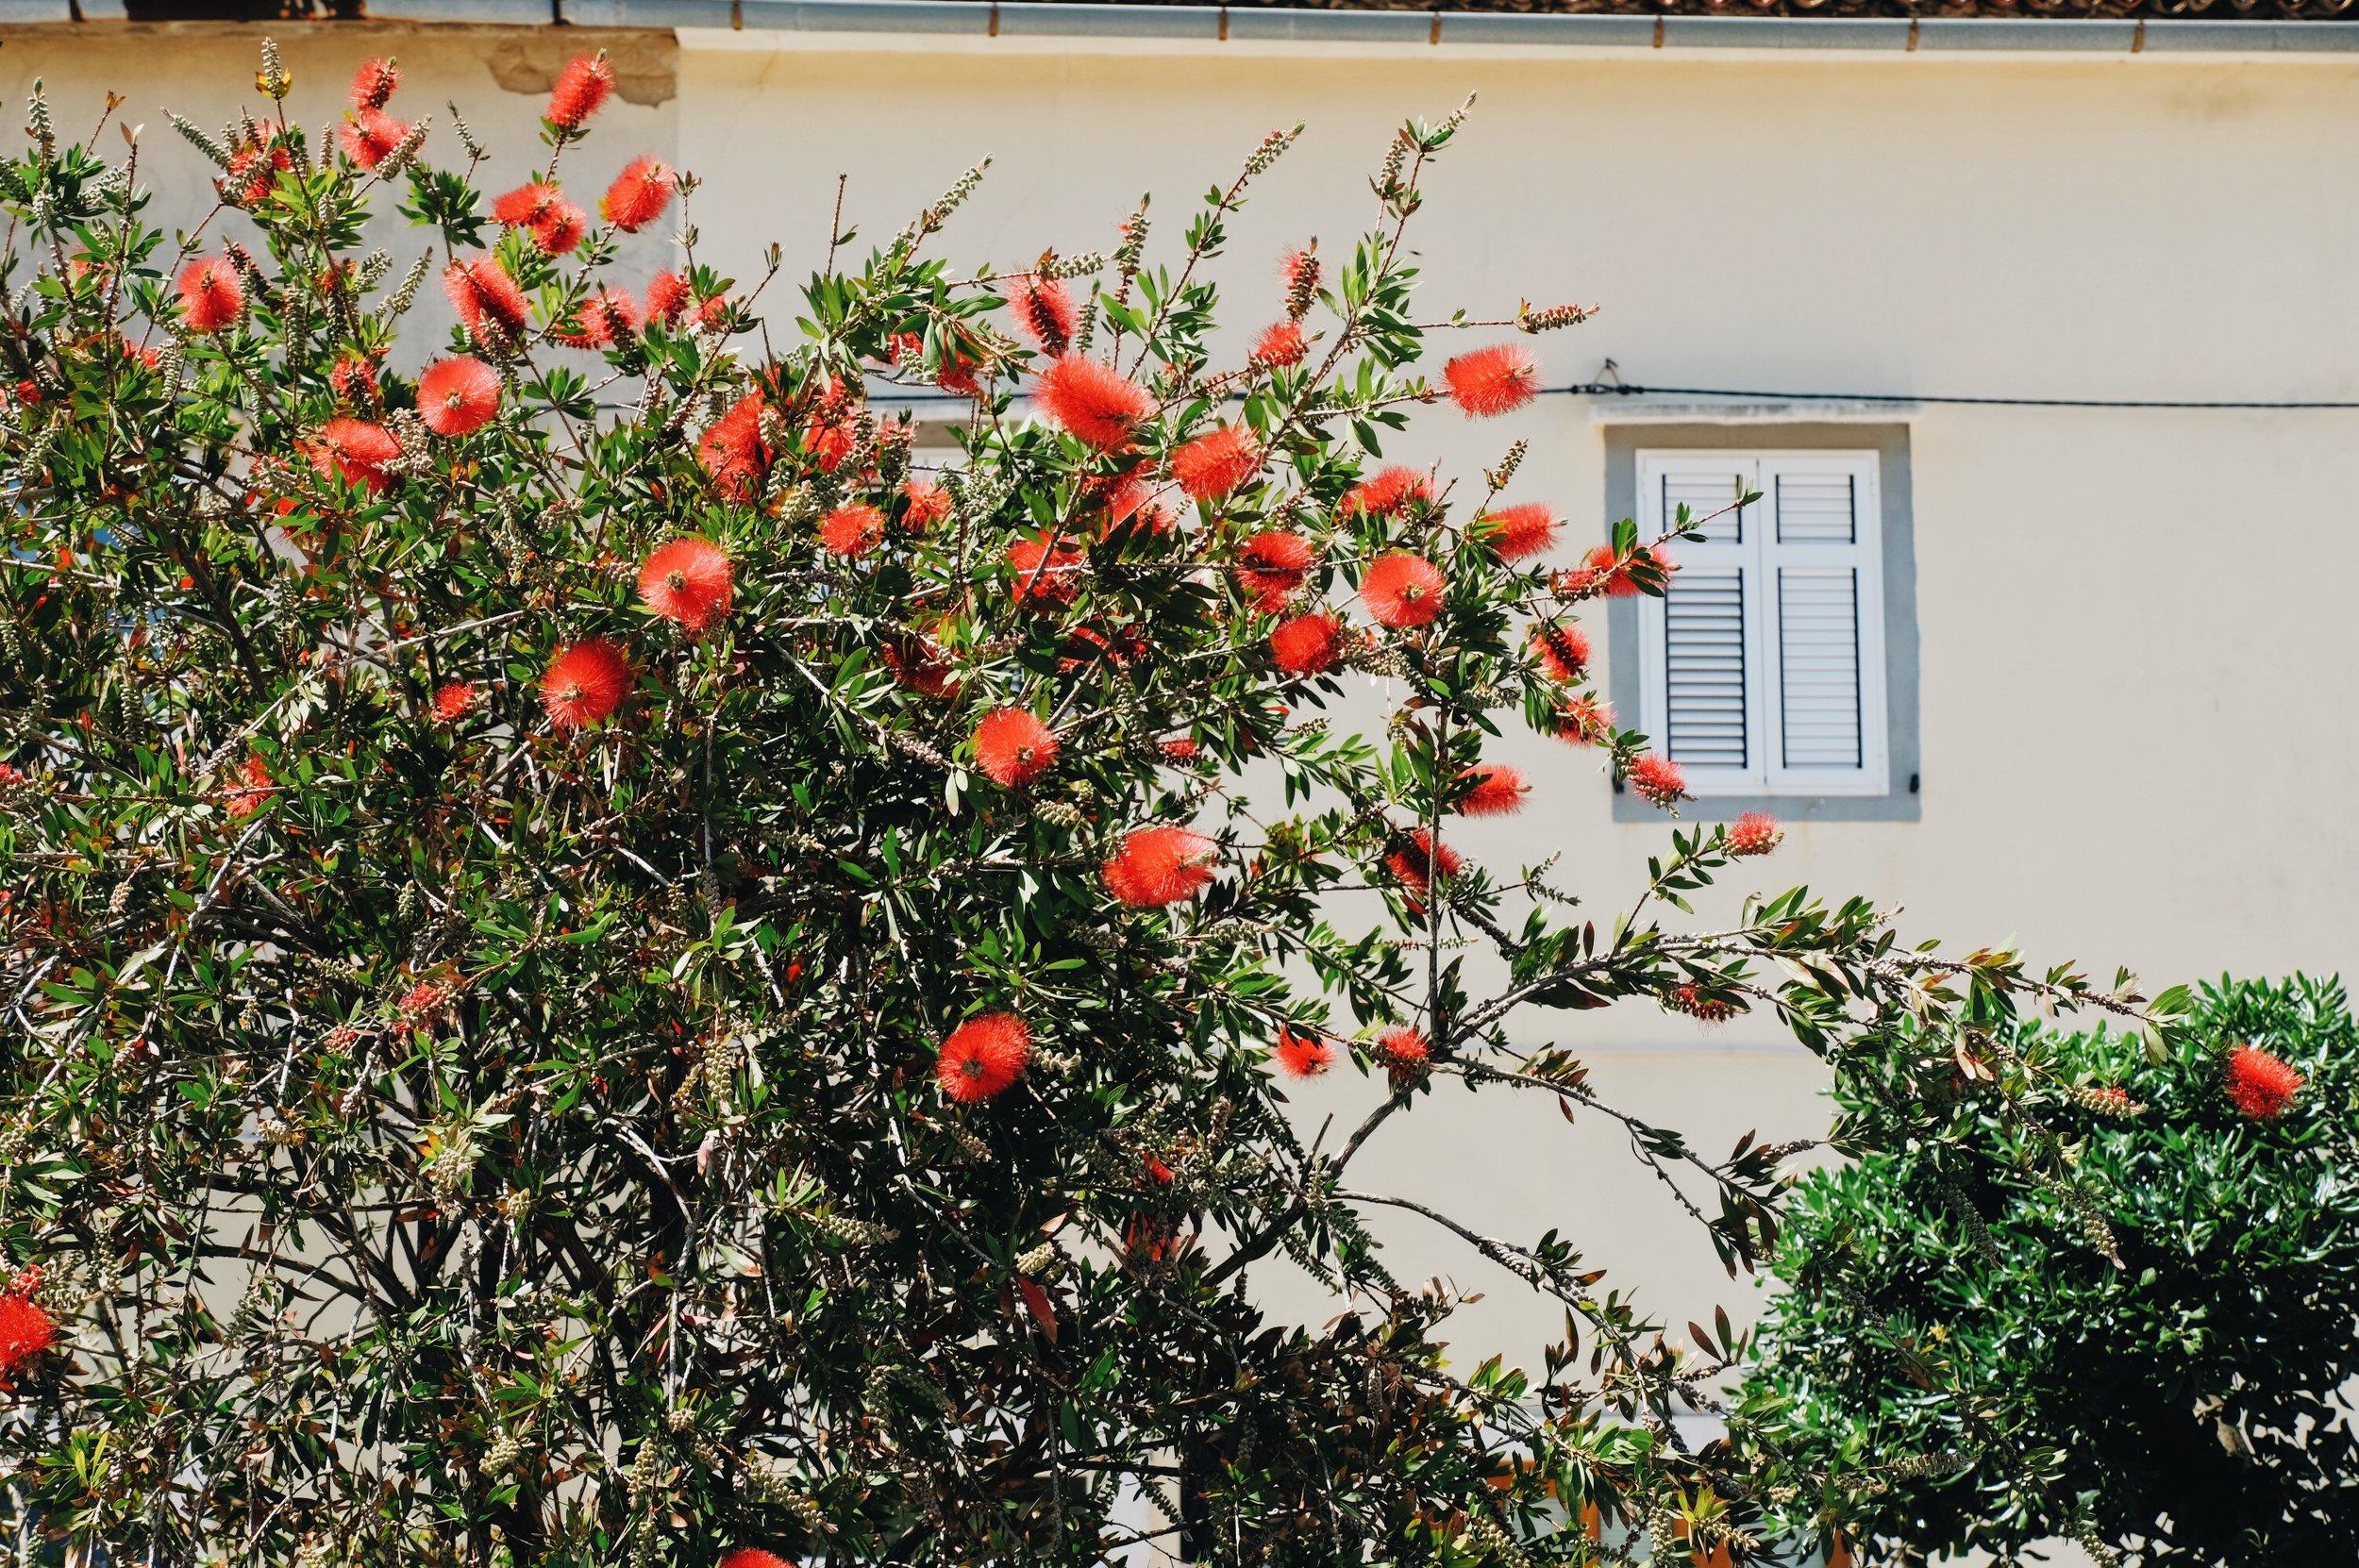 fat-creative-blog-2017-05-Unique-travel-destination- croatian-kvarner-region-cres-losinj-8.JPG